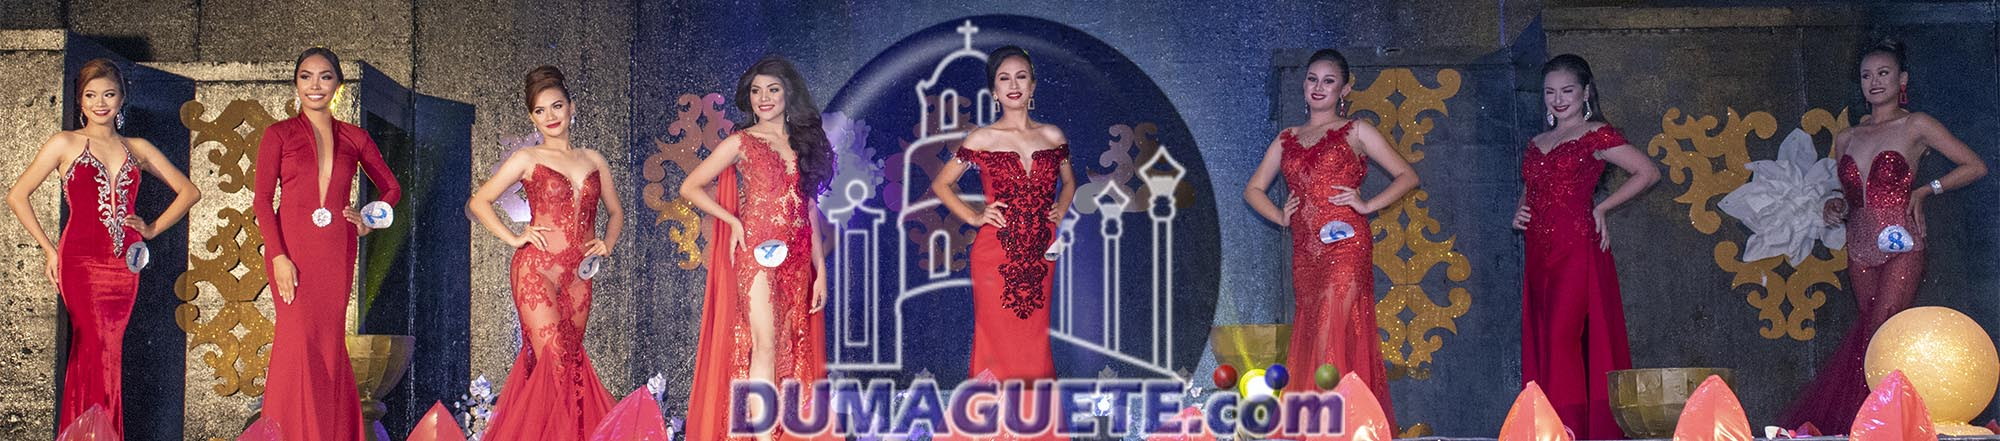 Miss Pandanyag 2019 - La Libertad - Negros Oriental